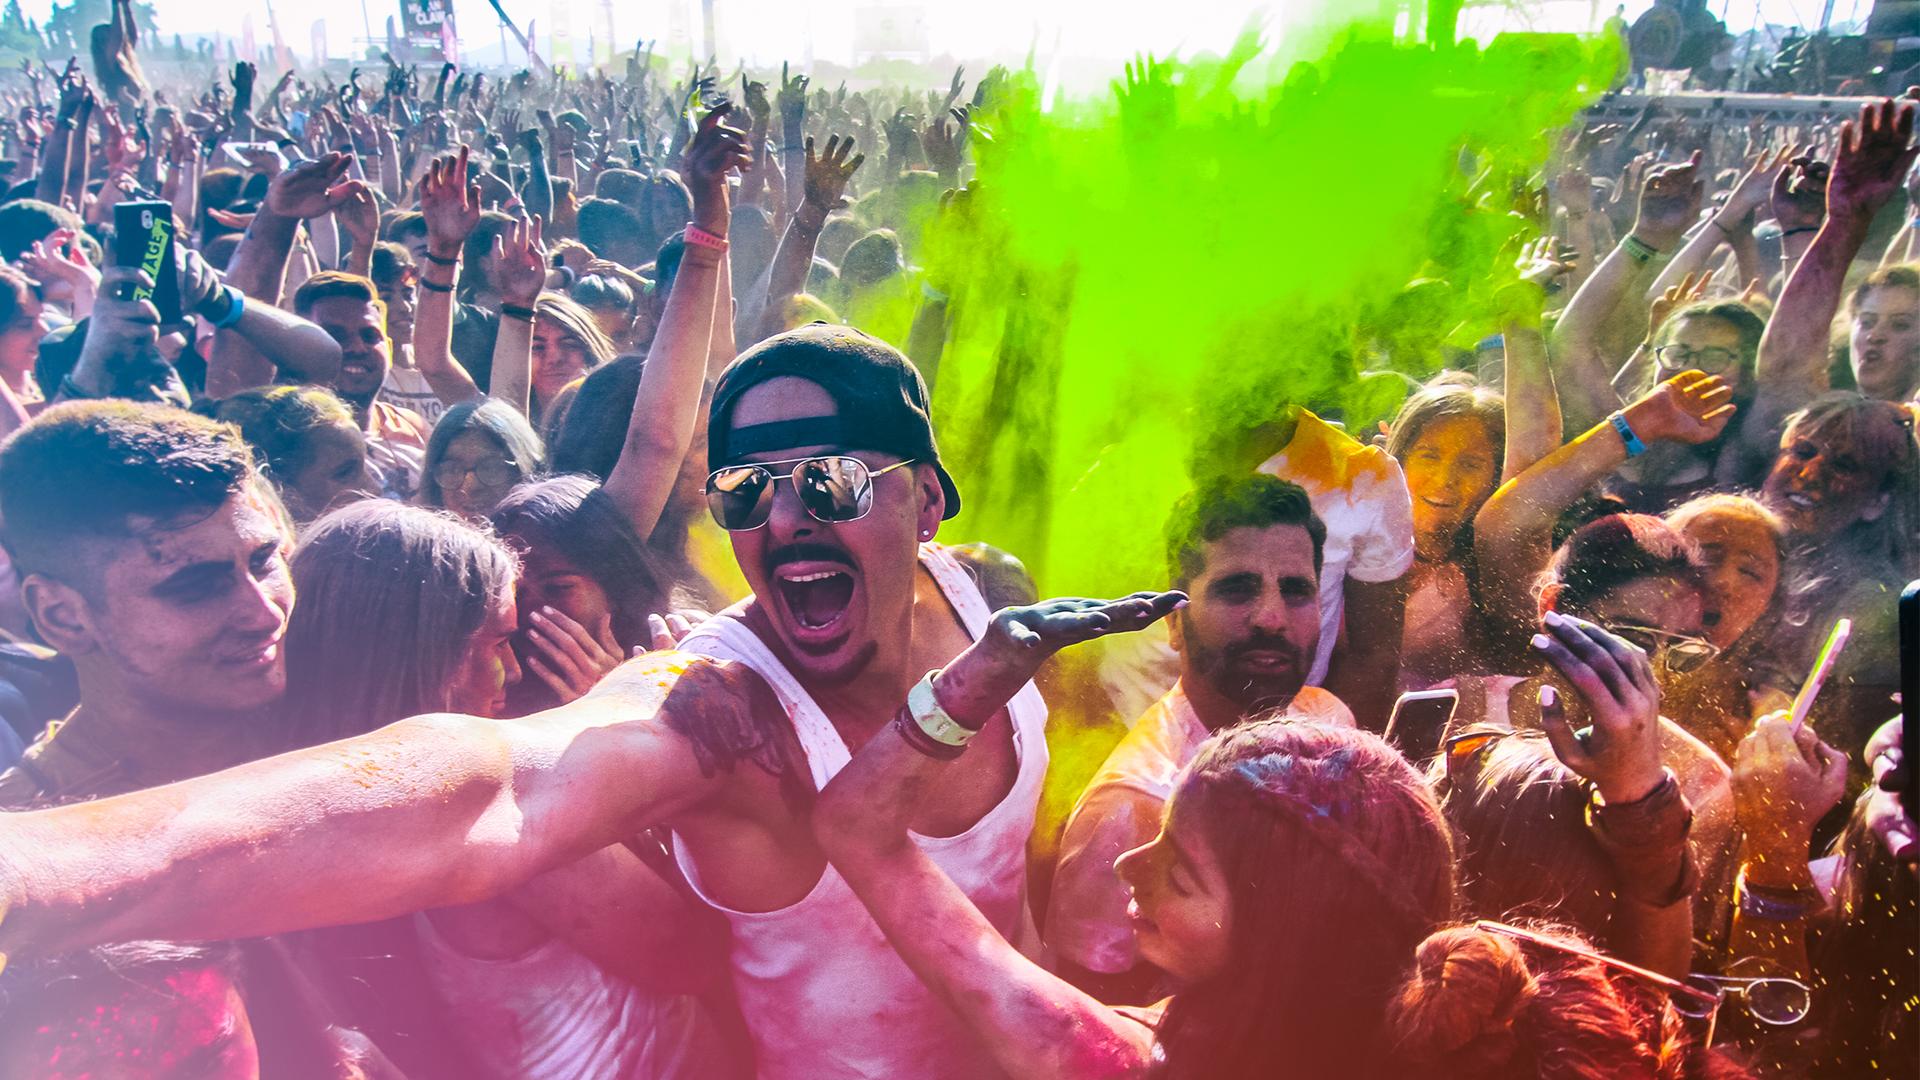 Bachelor3 Colour Day Festival